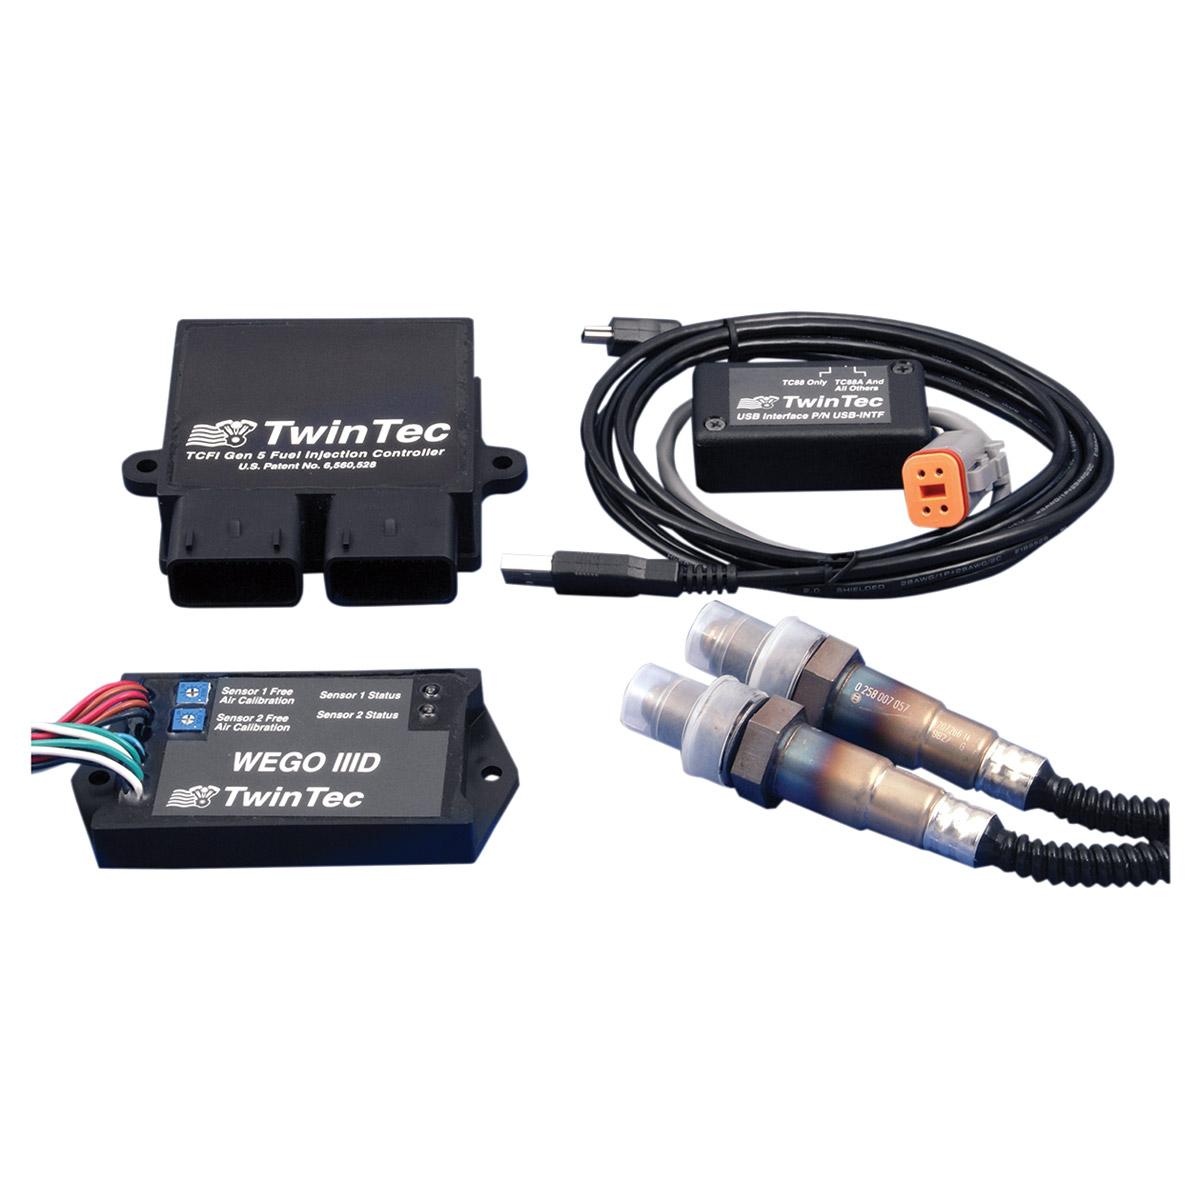 Daytona Sensors USB Interface 6/' USB cable Twin Tec